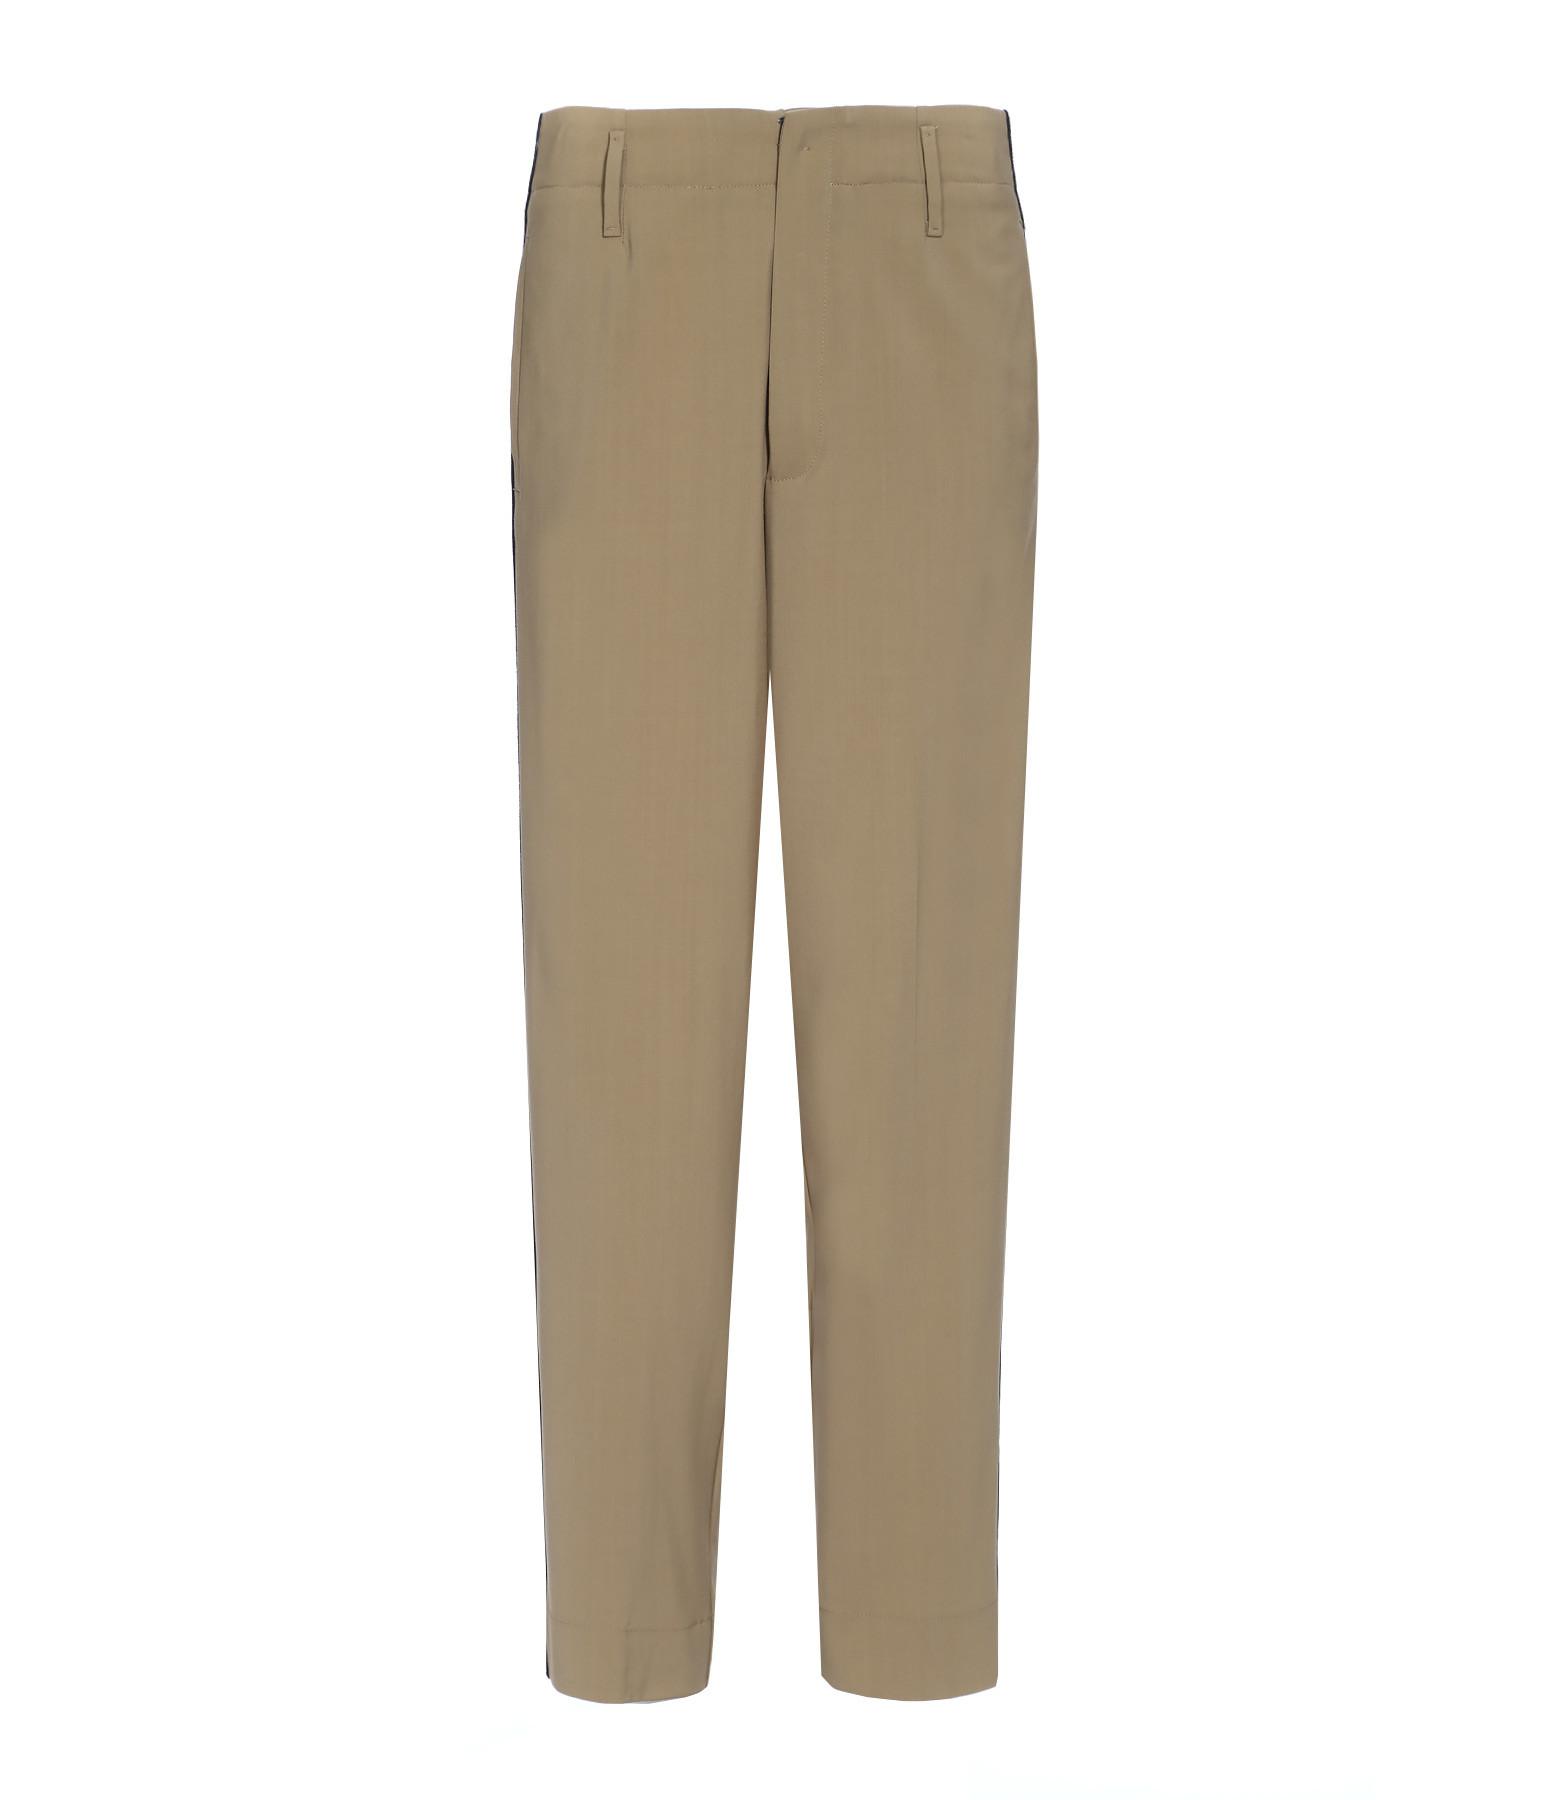 FORTE_FORTE - Pantalon Rayures Laine Beige